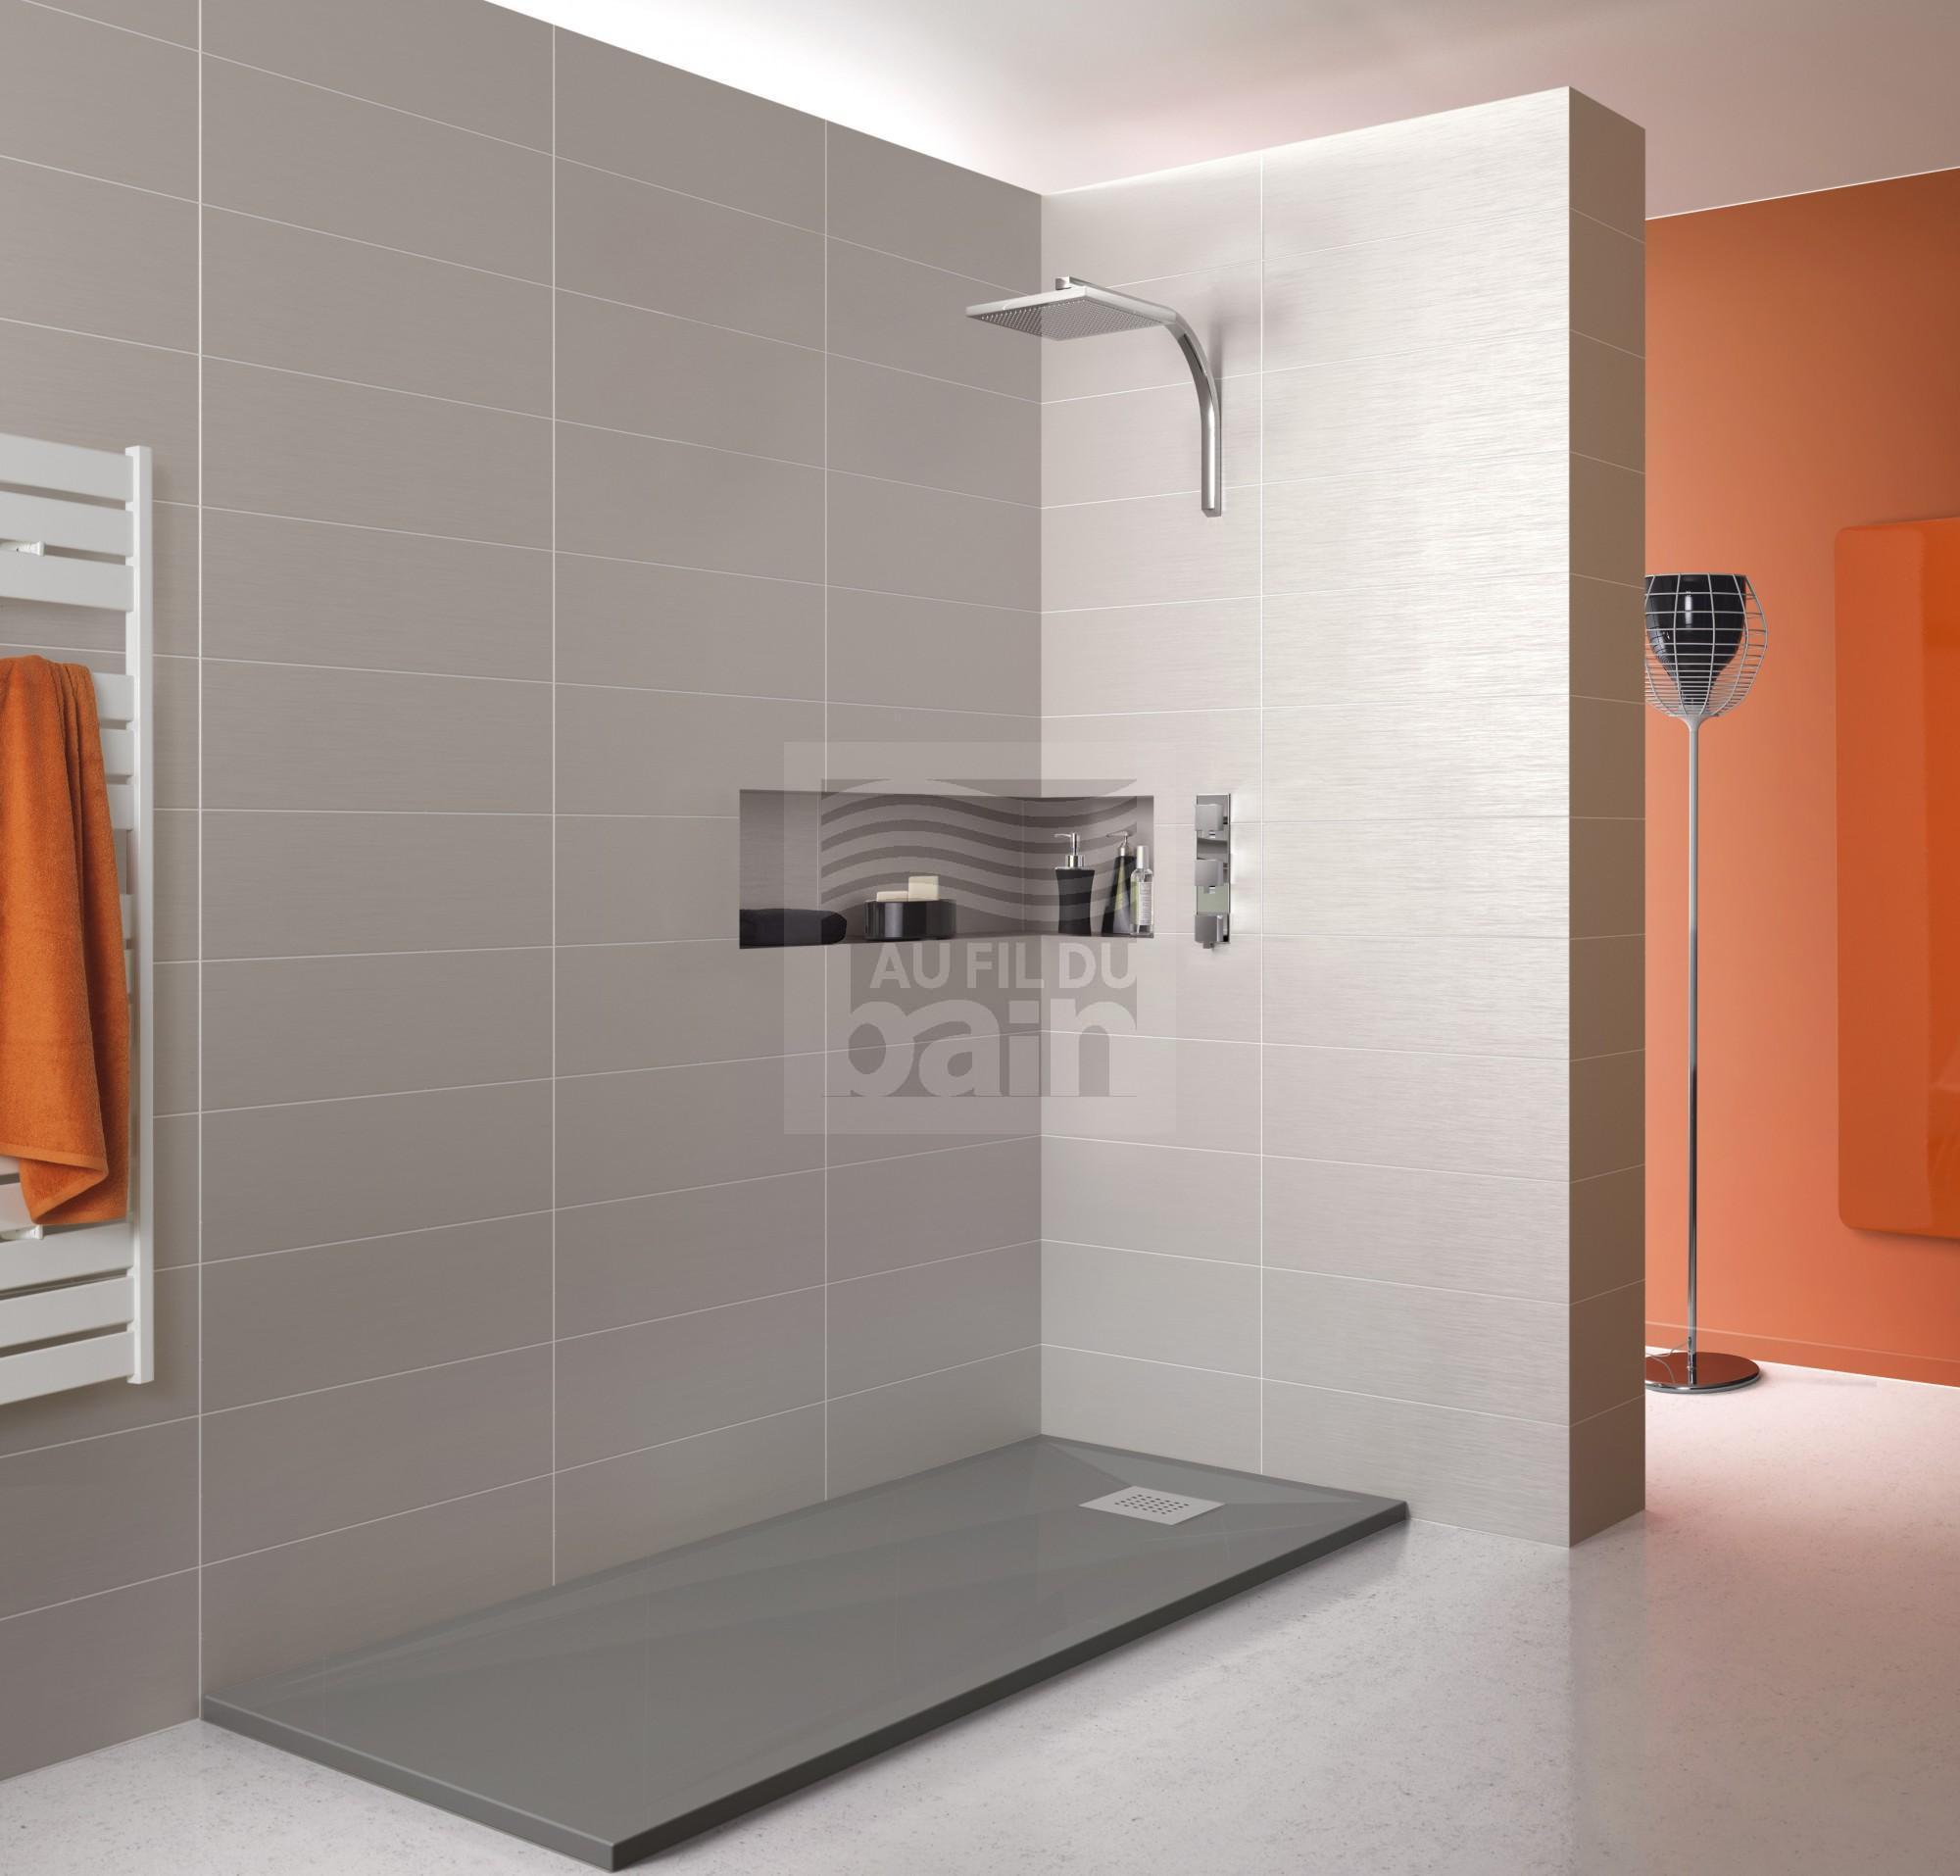 Receveurs de douche extra plat avec bonde en beton de synthese magasin pour vente de meubles - Receveurs de douche extra plat ...